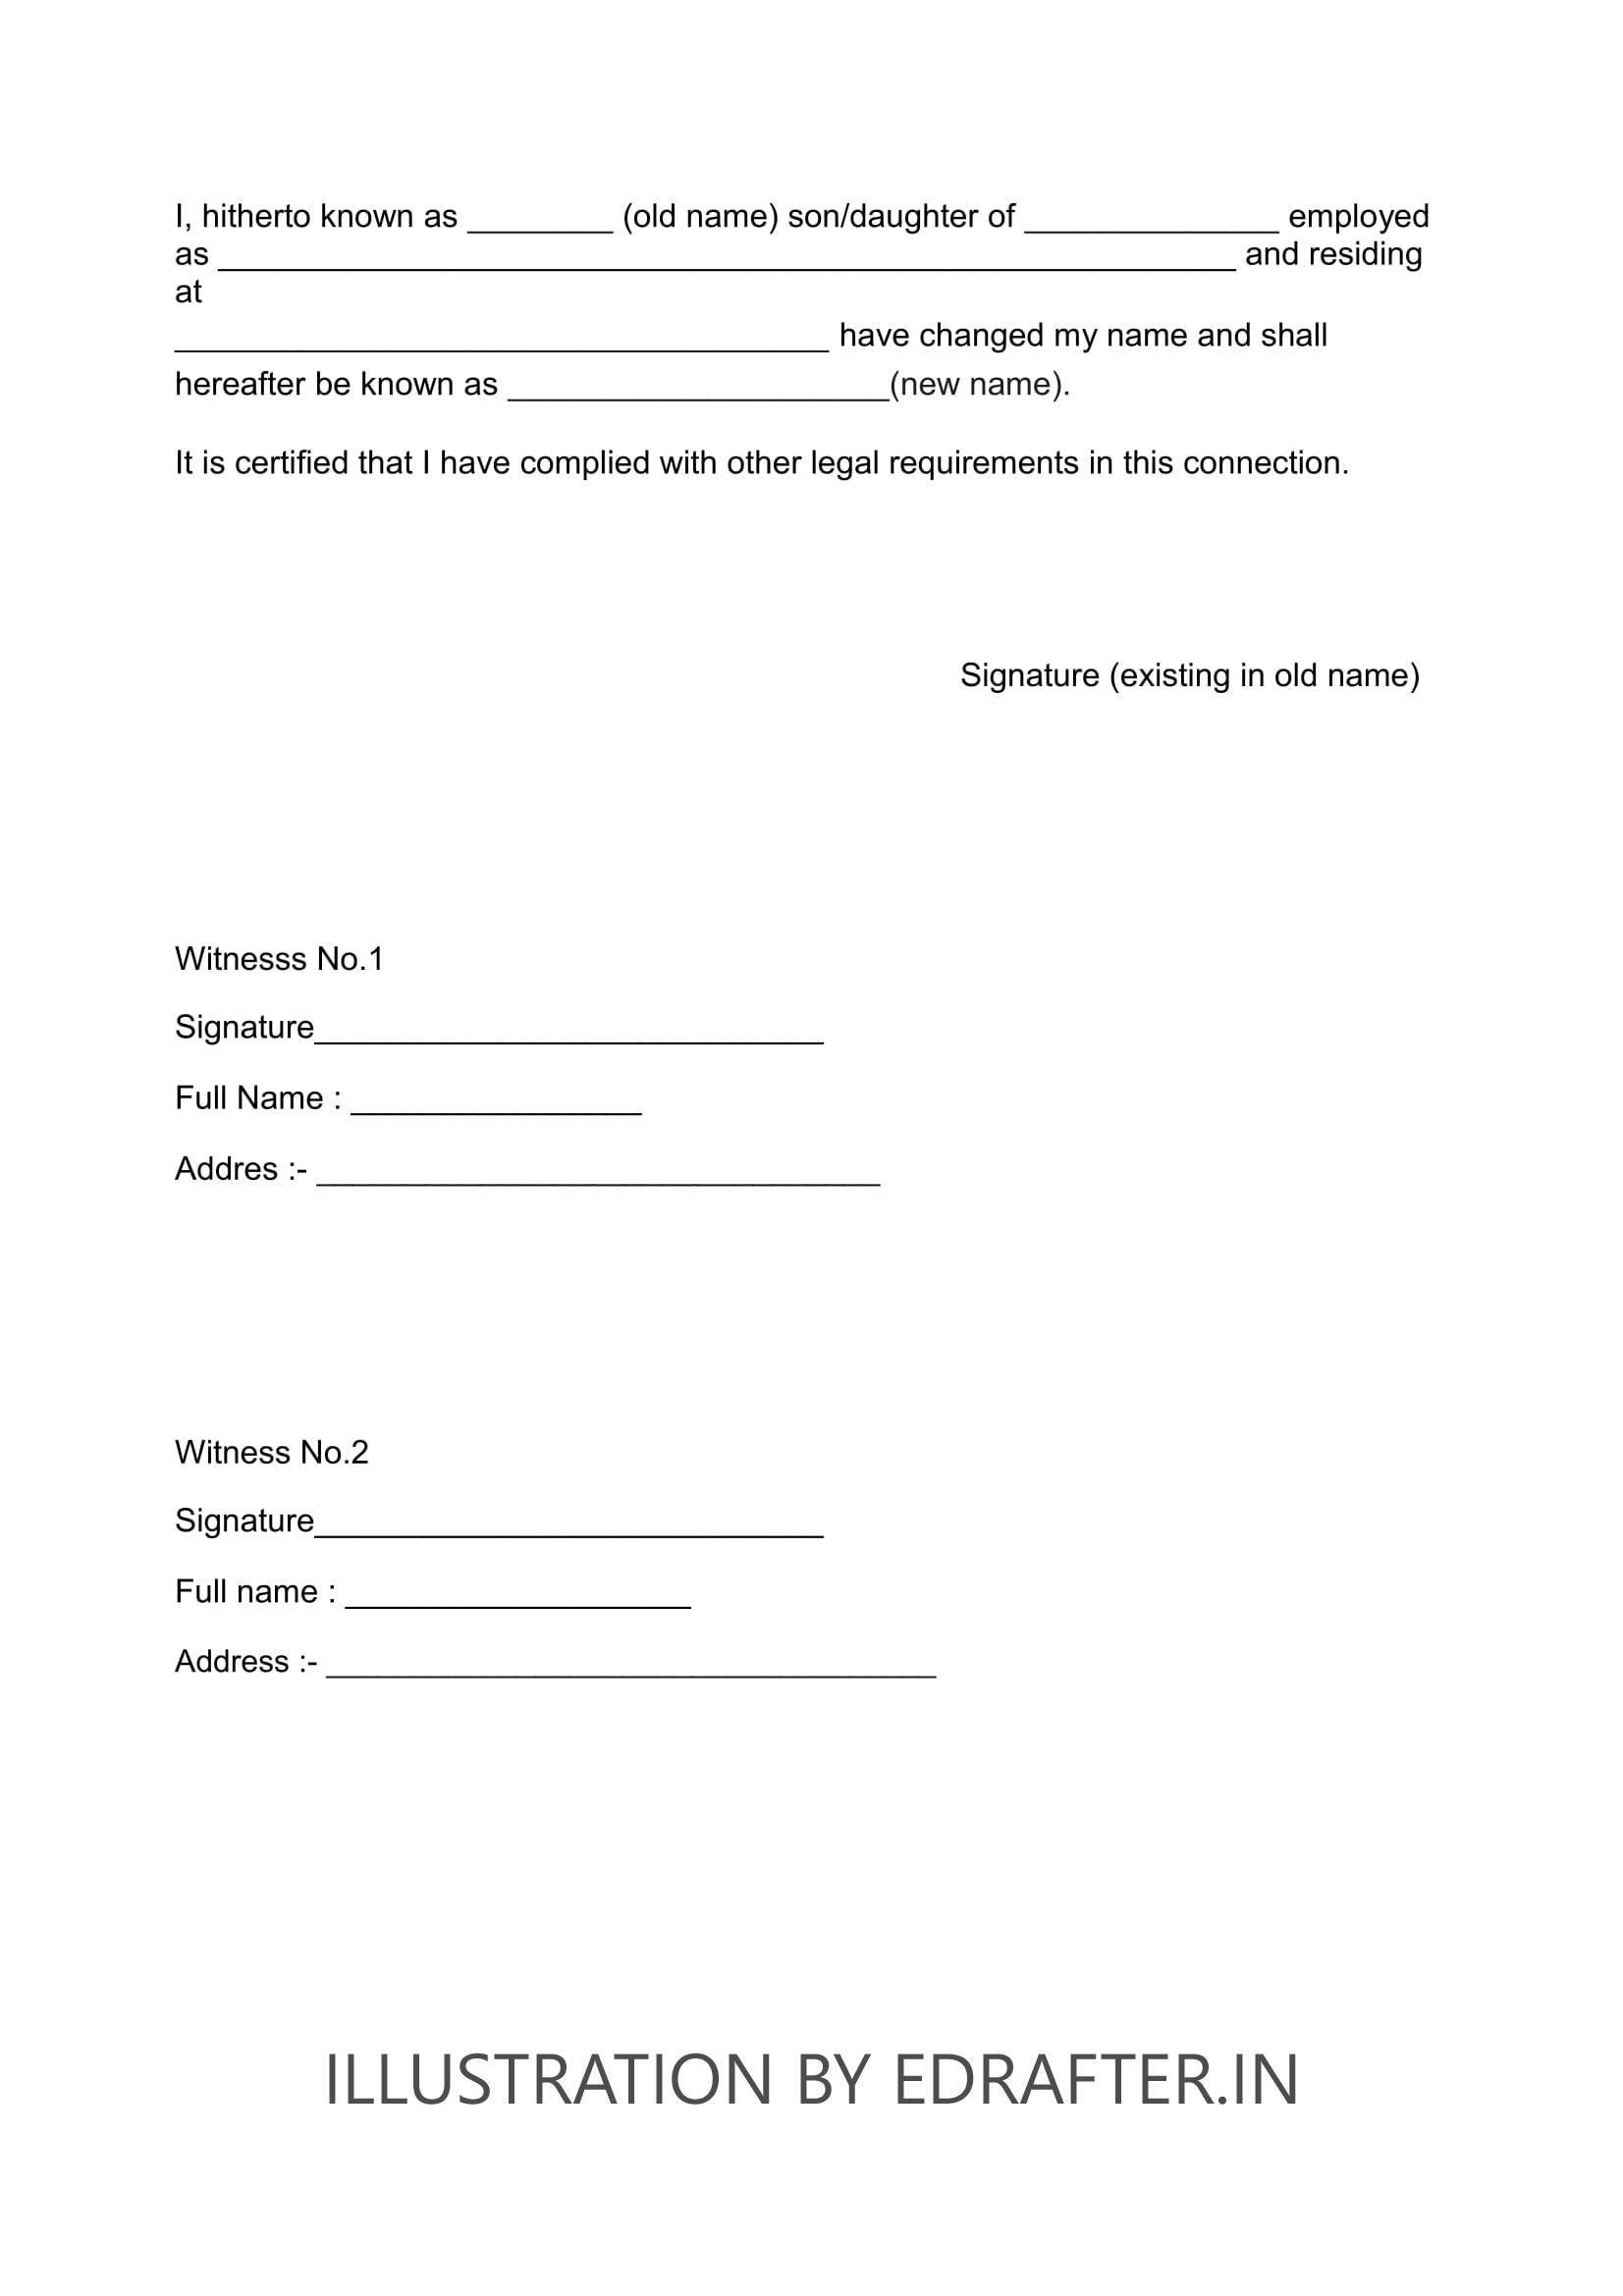 Affidavit Format For Marriage Certificate In Mumbai